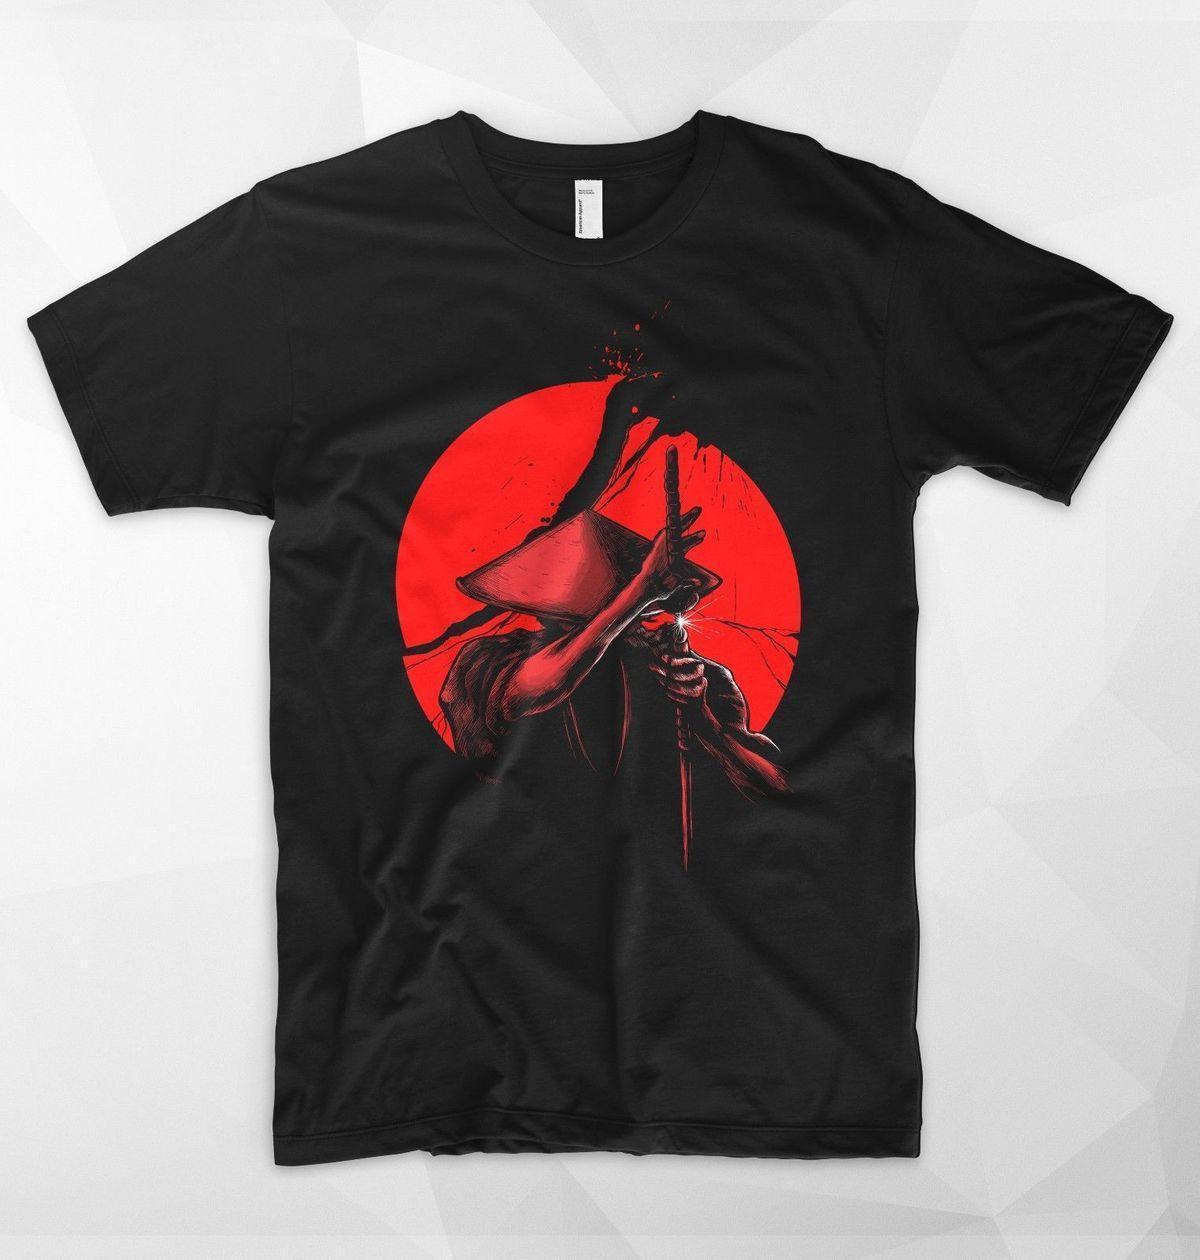 fd9489219 Samurai Slice T Shirt Top Japan Warrior Japanese Sword Katana Coolie Rice  Hat Print Casual T-Shirt Men Brand Top Tee